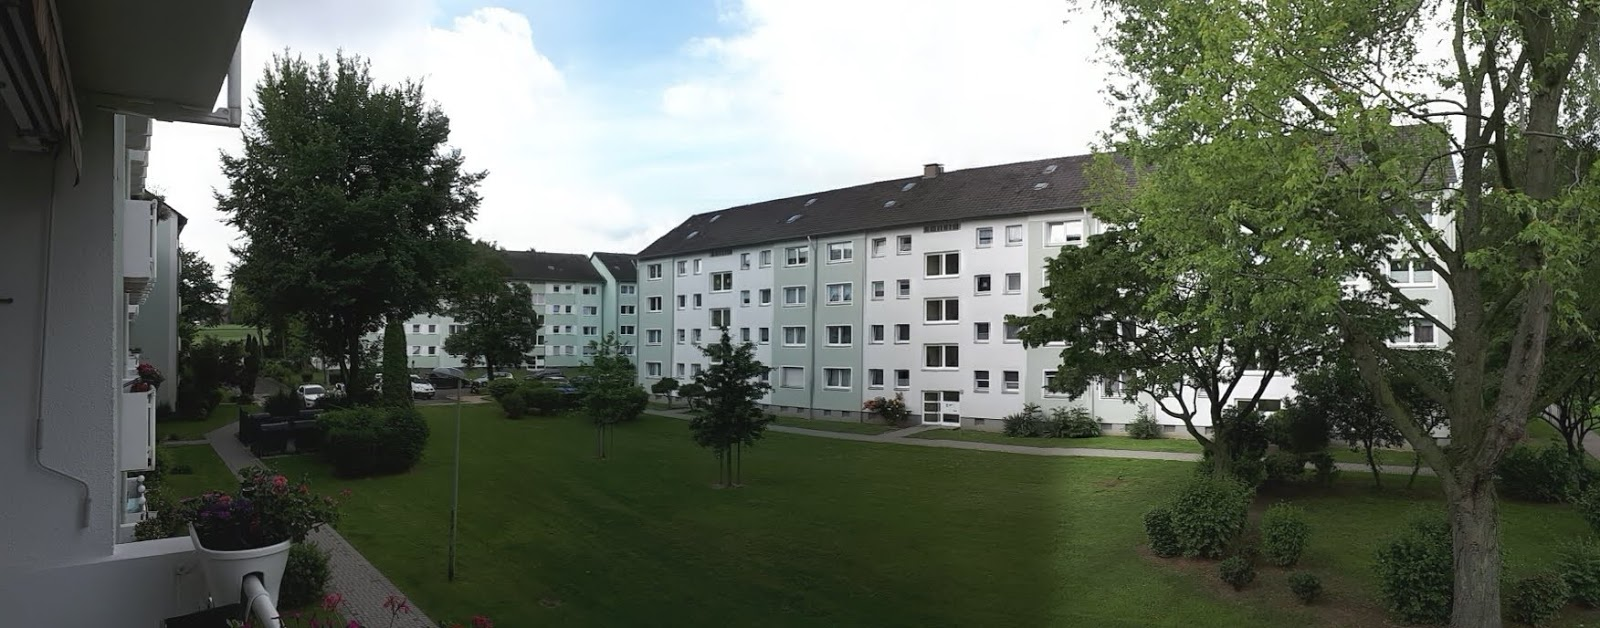 Grossstadt Indianer Mai 2019